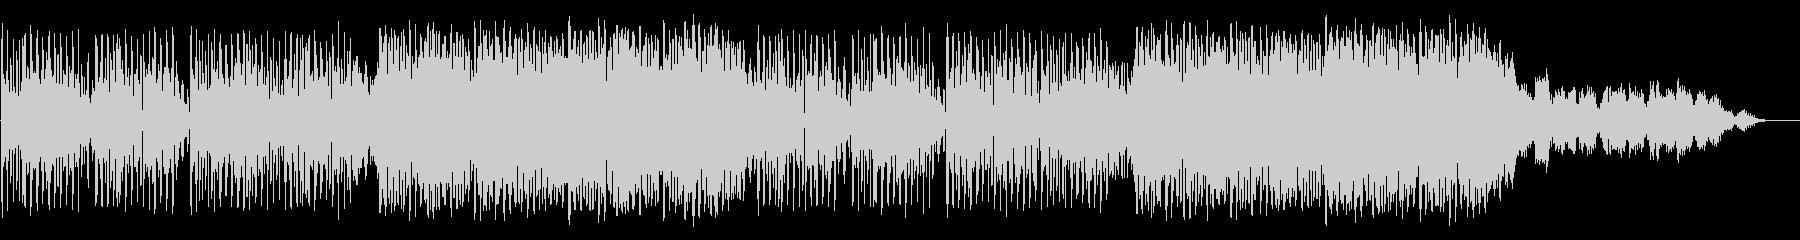 Low tempo EDM for cello and violin's unreproduced waveform